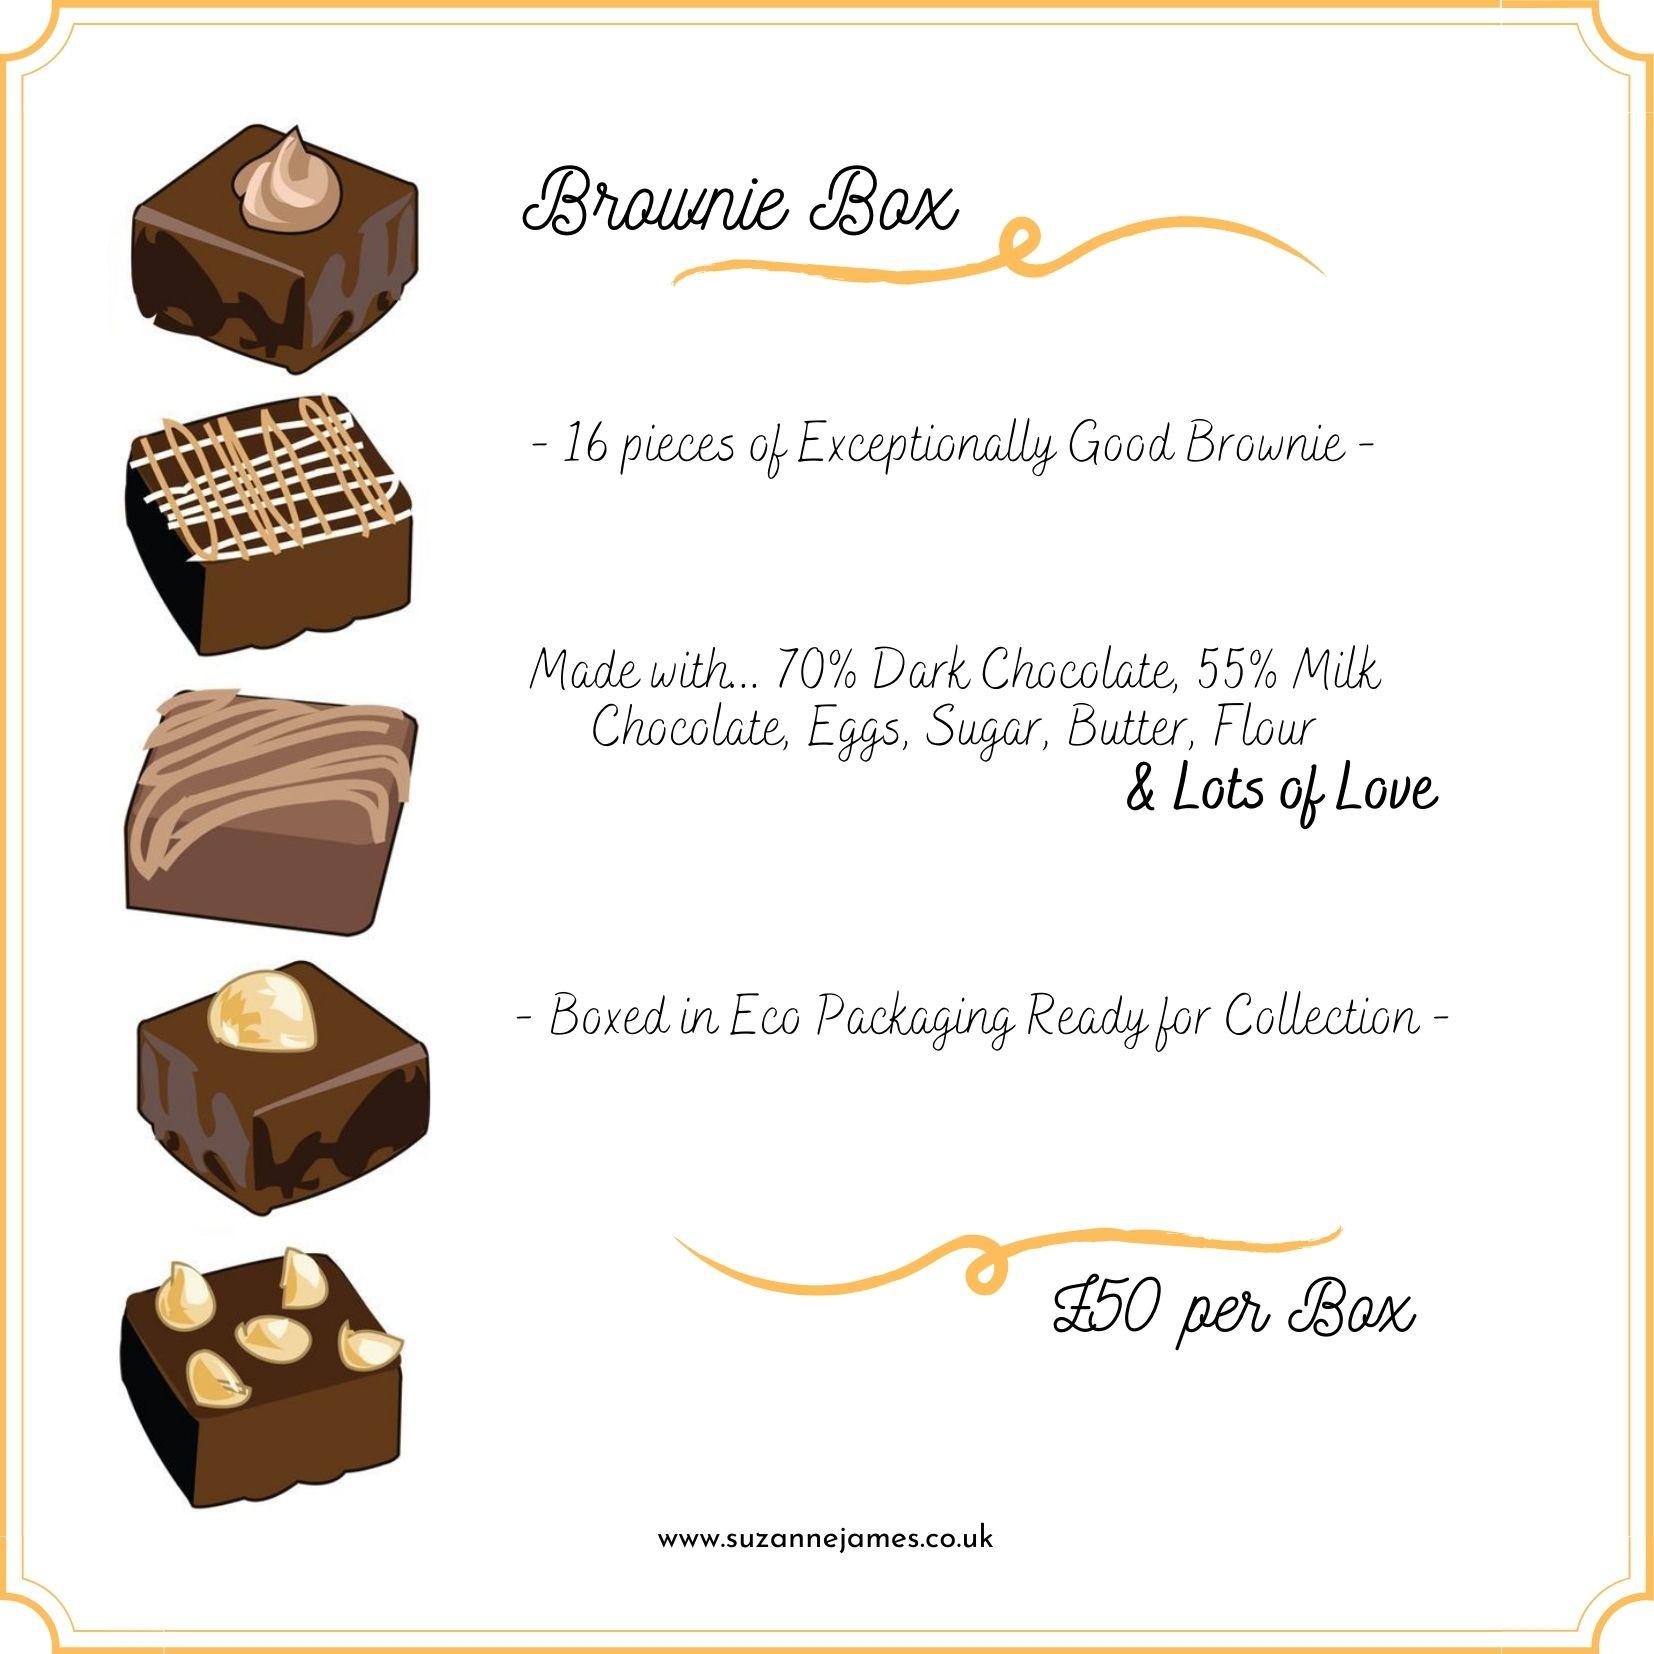 Brownie Box 16 Brownie Pieces Suzanne James